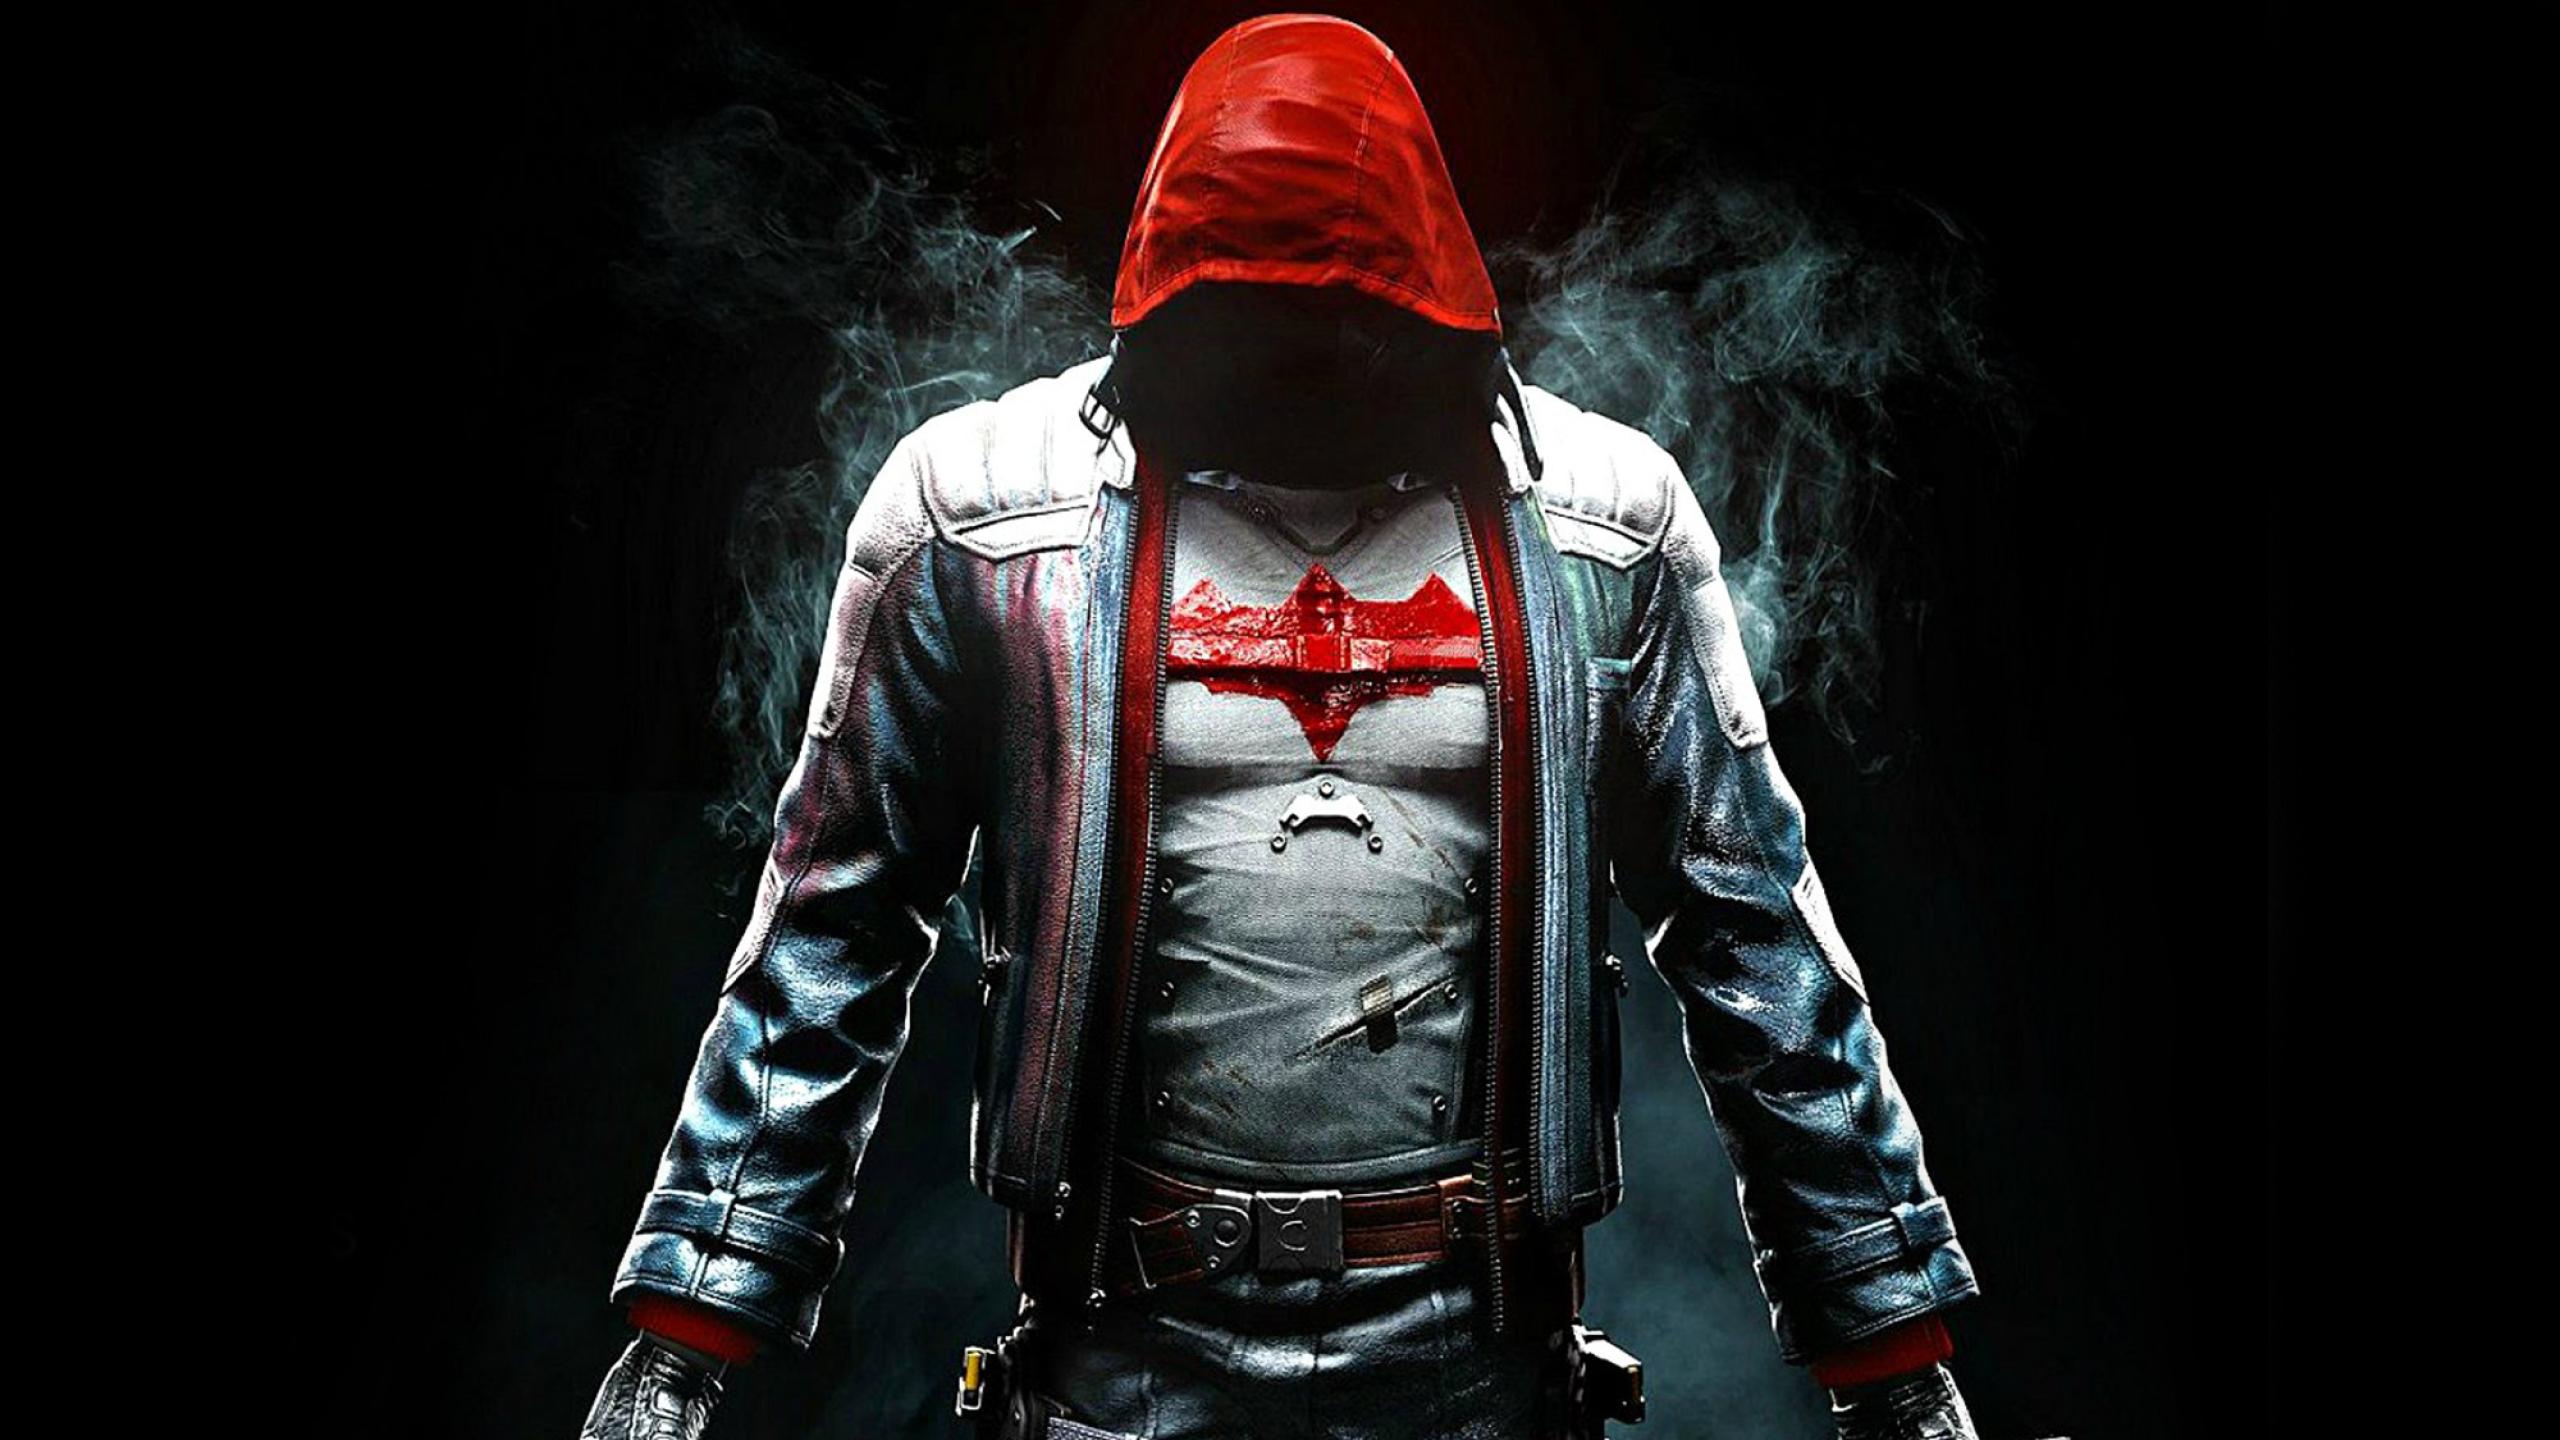 2560x1440 Batman Arkham Knight Red Hood 1440p Resolution